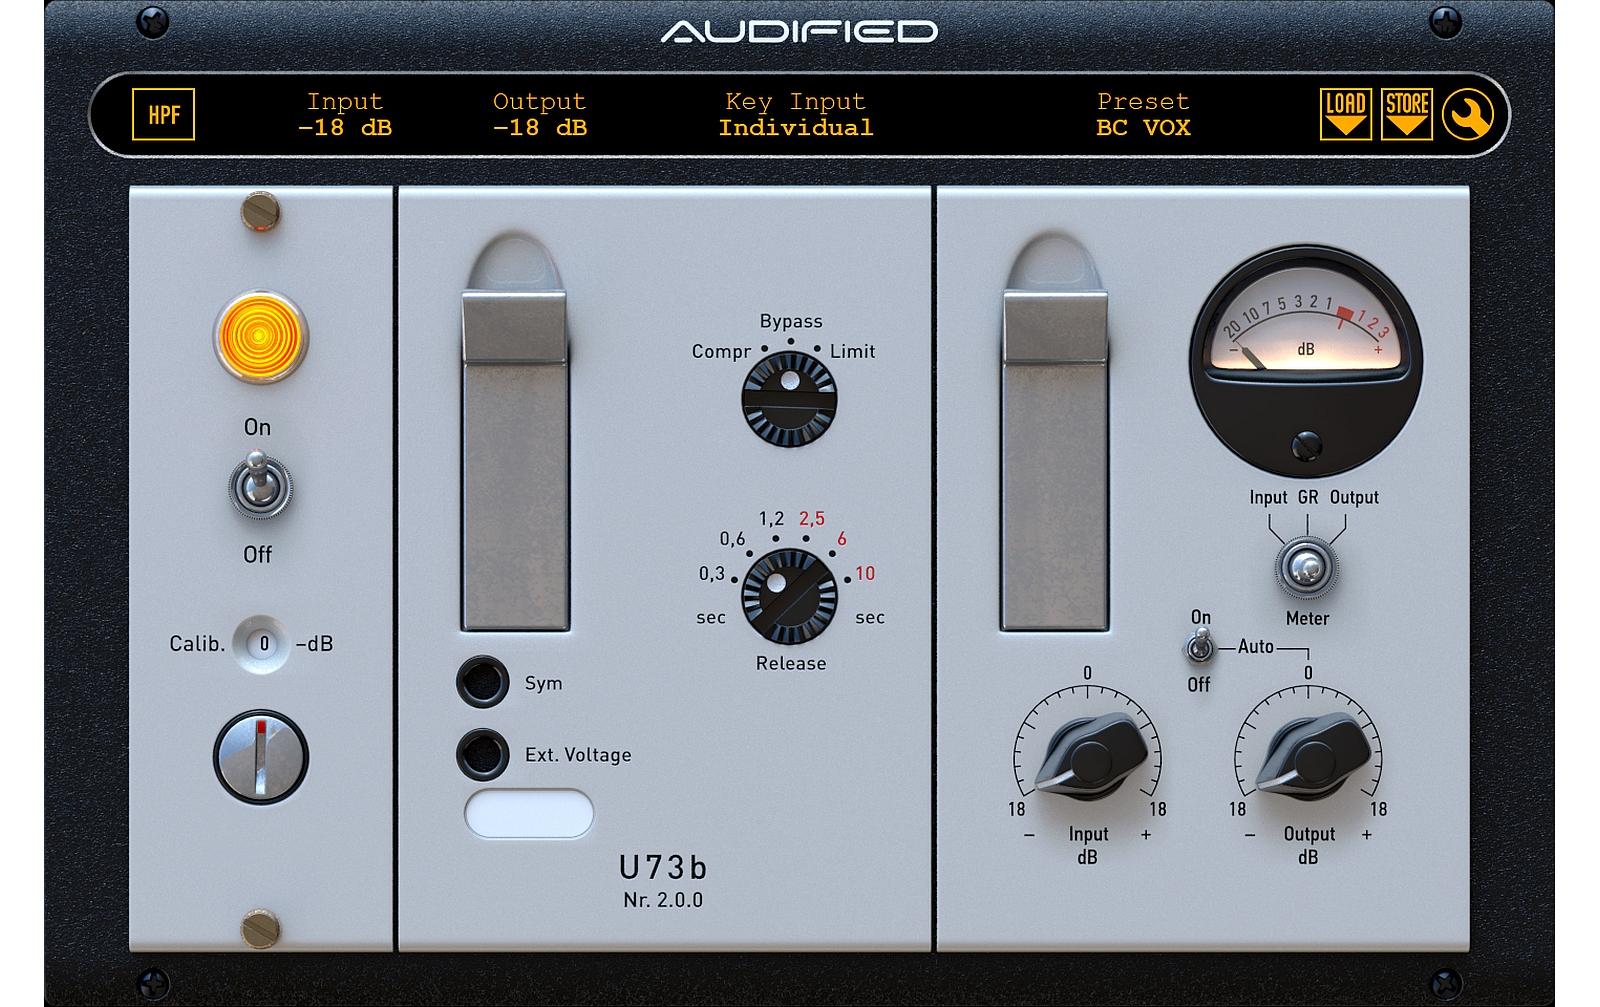 audified-u73b-compressor-esd-download-